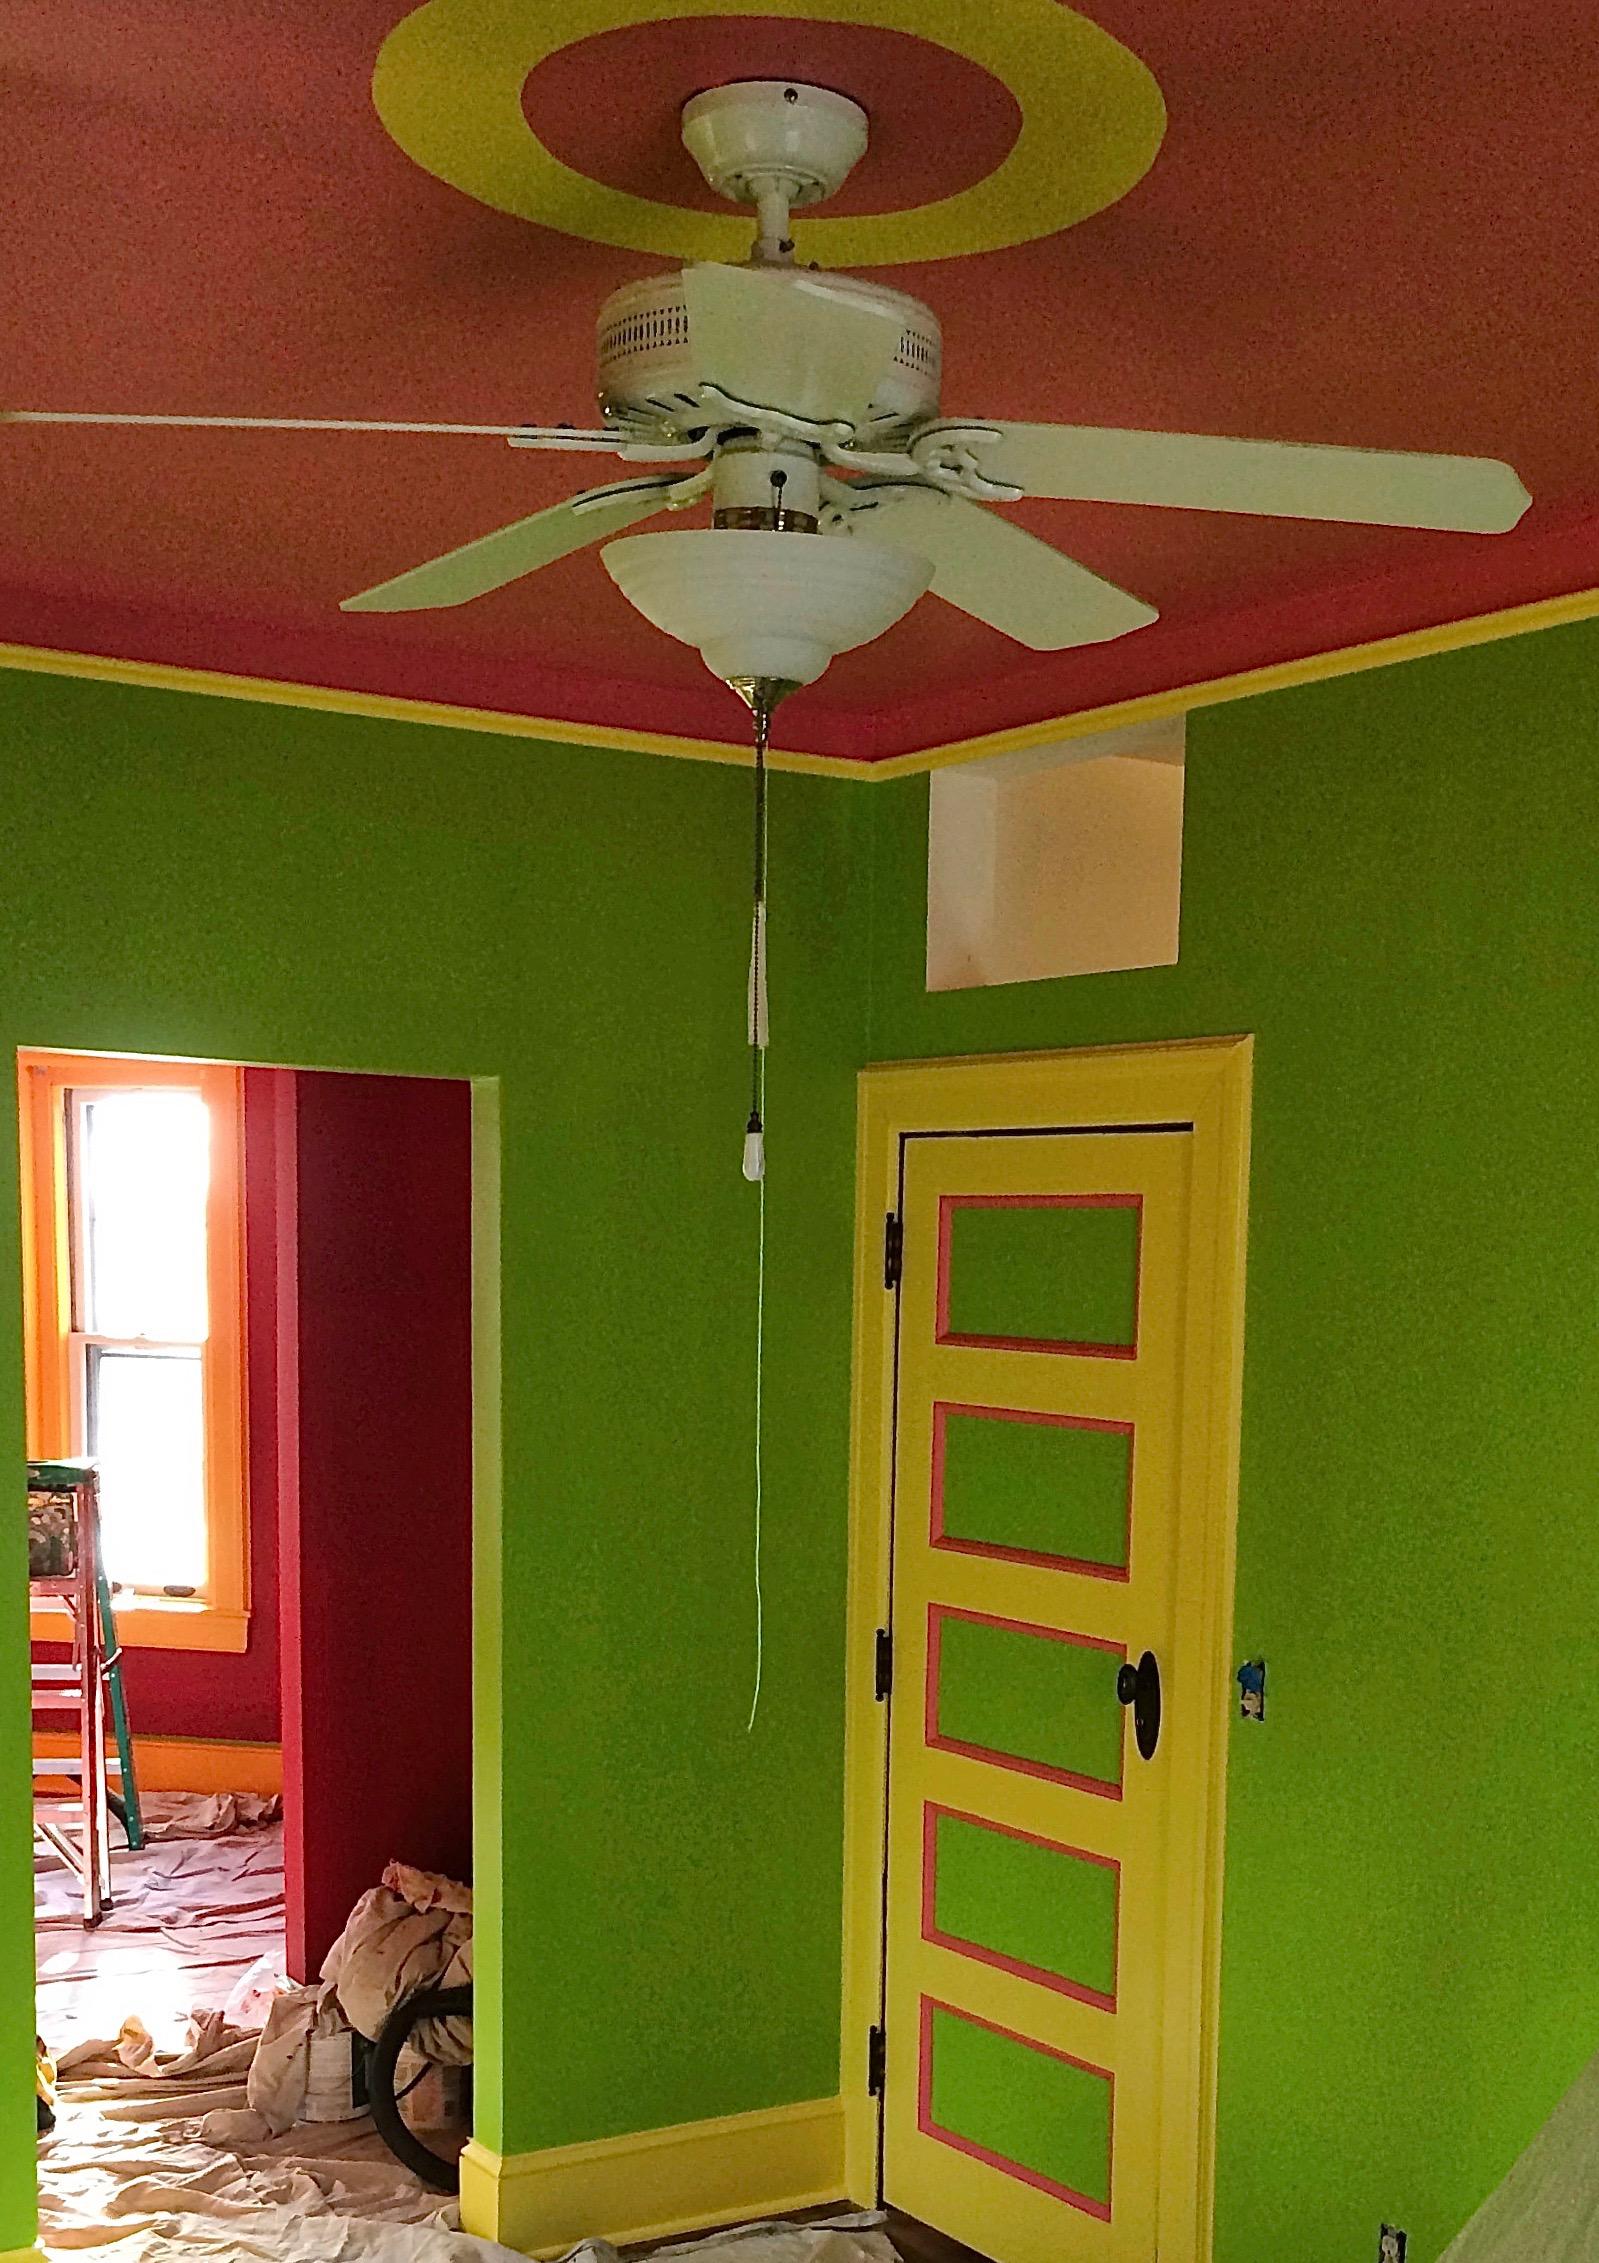 green_walls.jpg